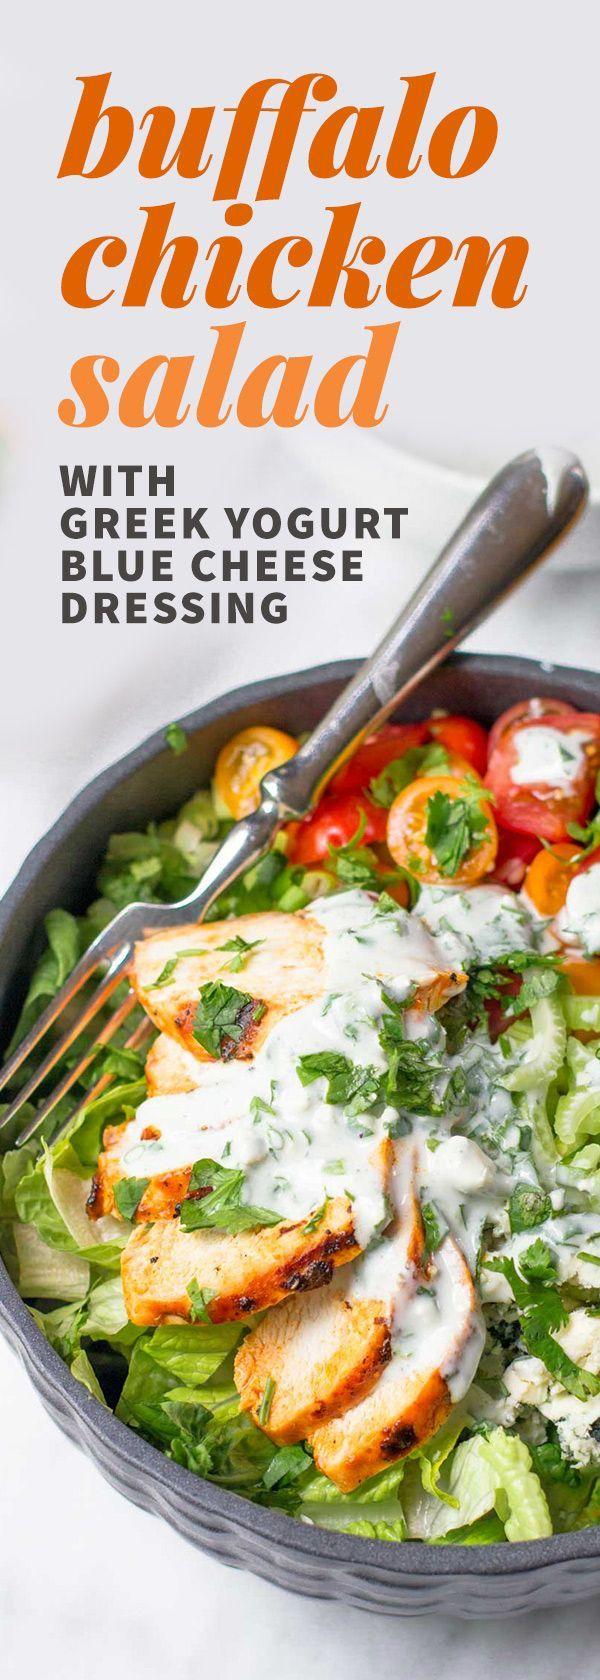 Grilled Buffalo Chicken Salad with Greek Yogurt Blue Cheese Dressing